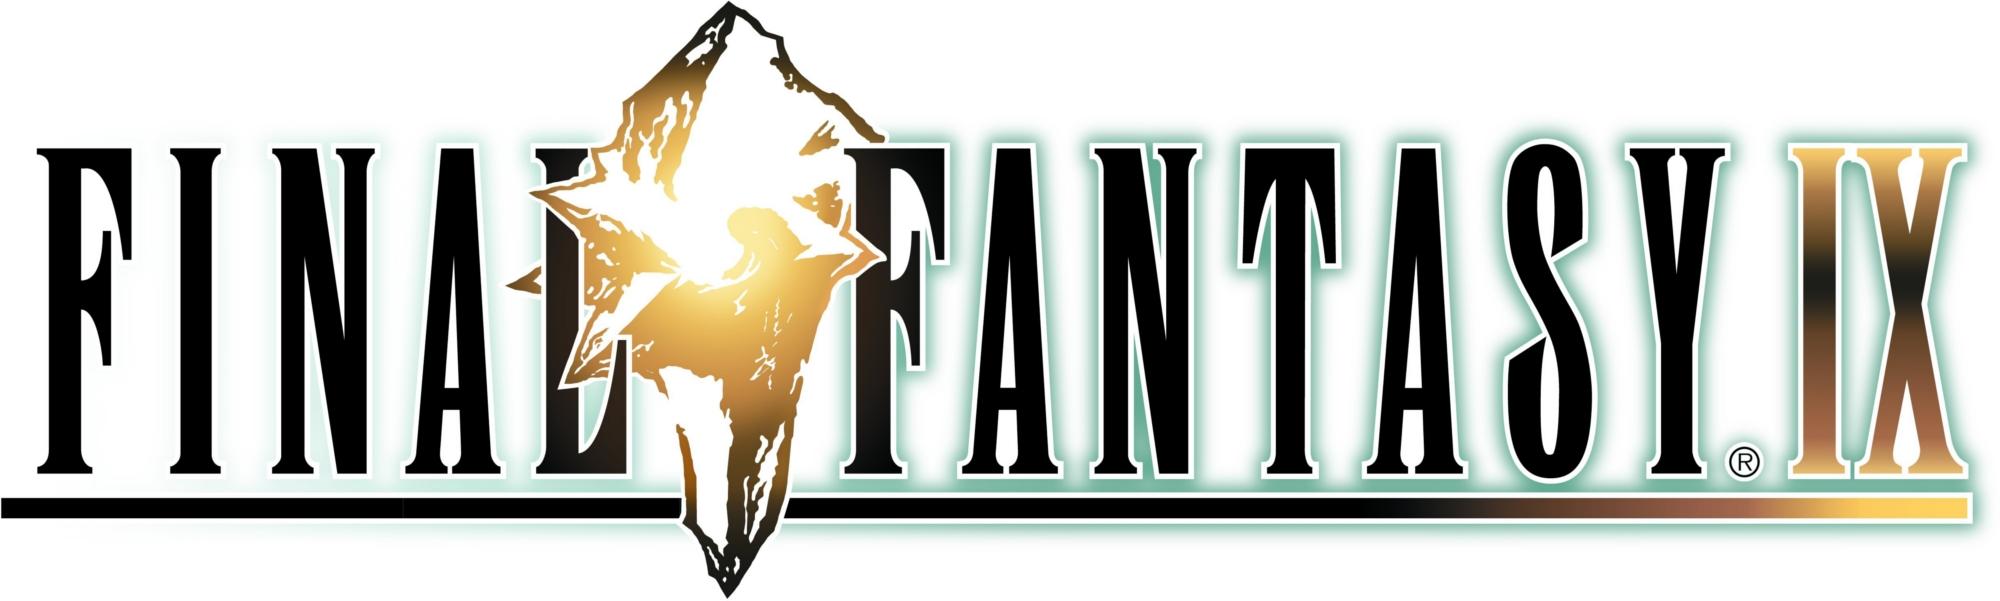 Final Fantasy IX Logo